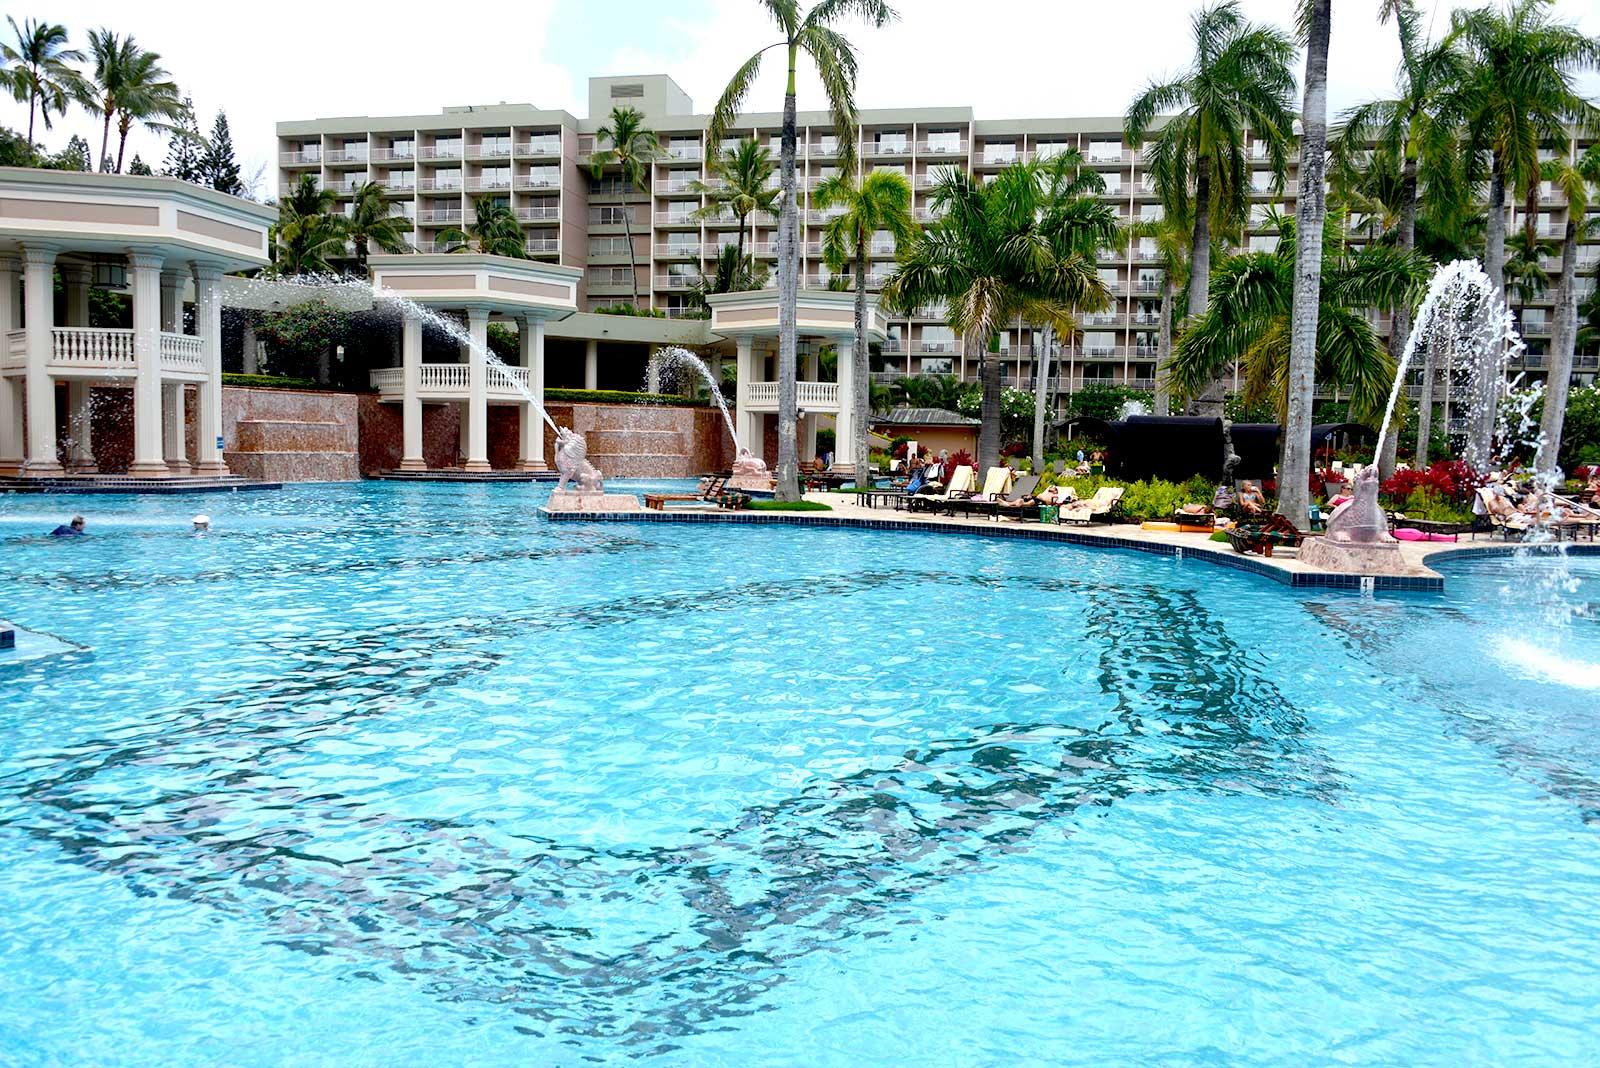 Marriott-Kauai-Beach-Club-Resort-20